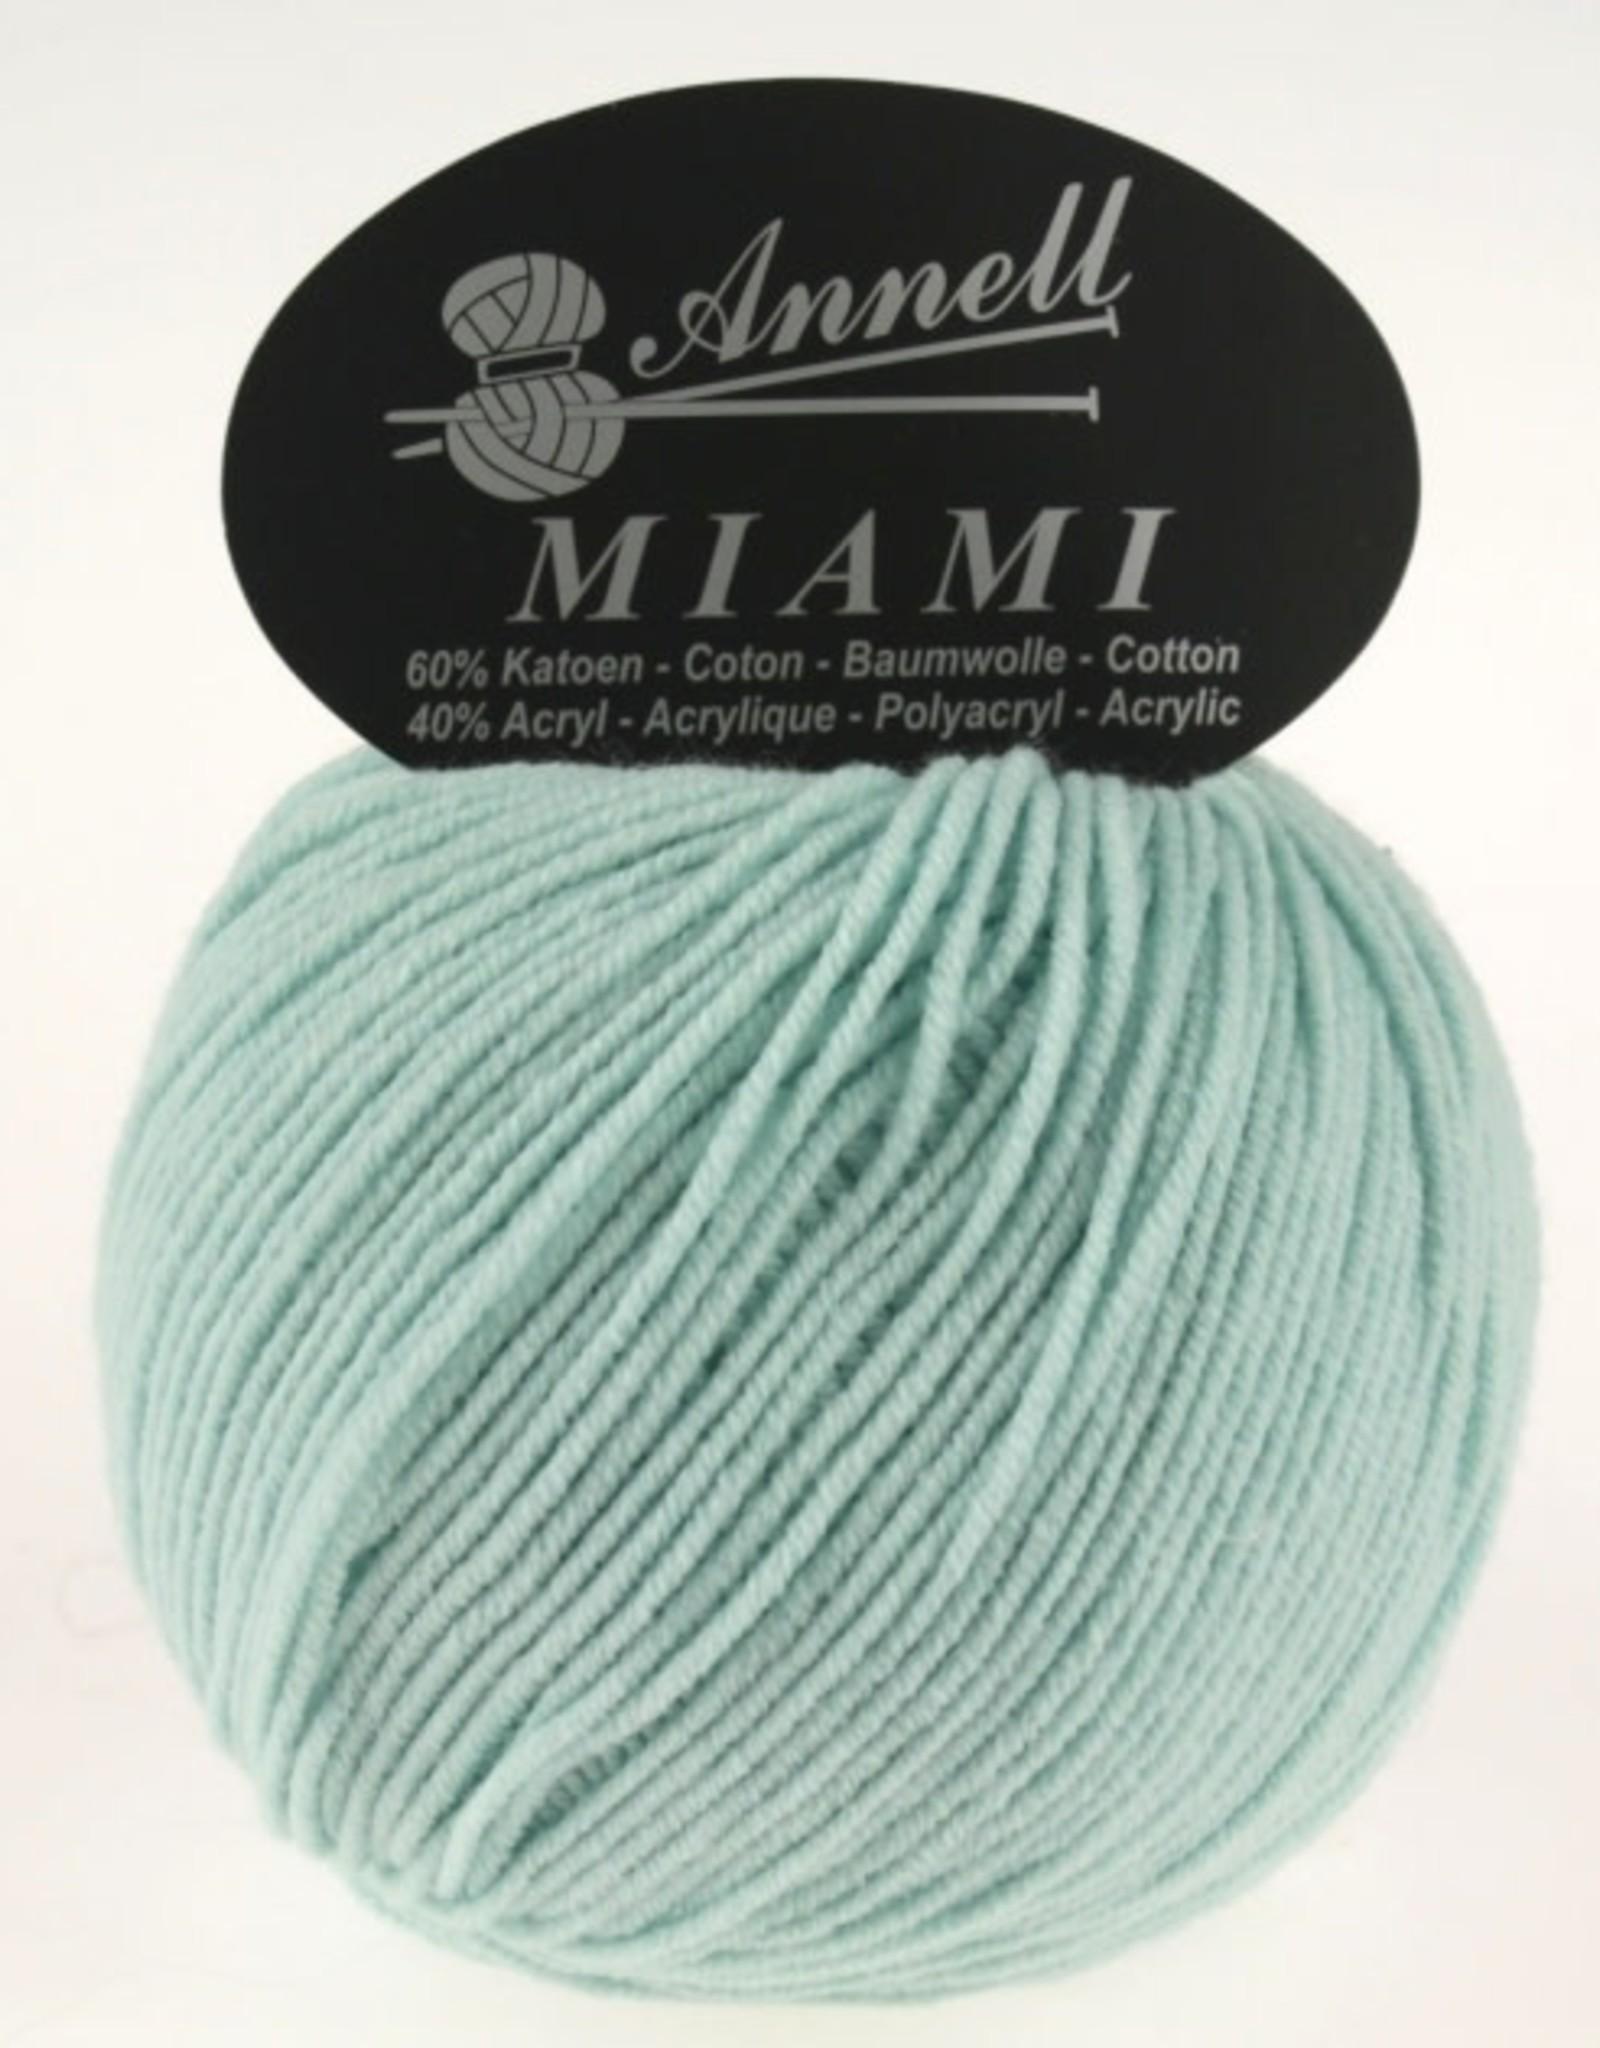 Annell Annell Miami 8922